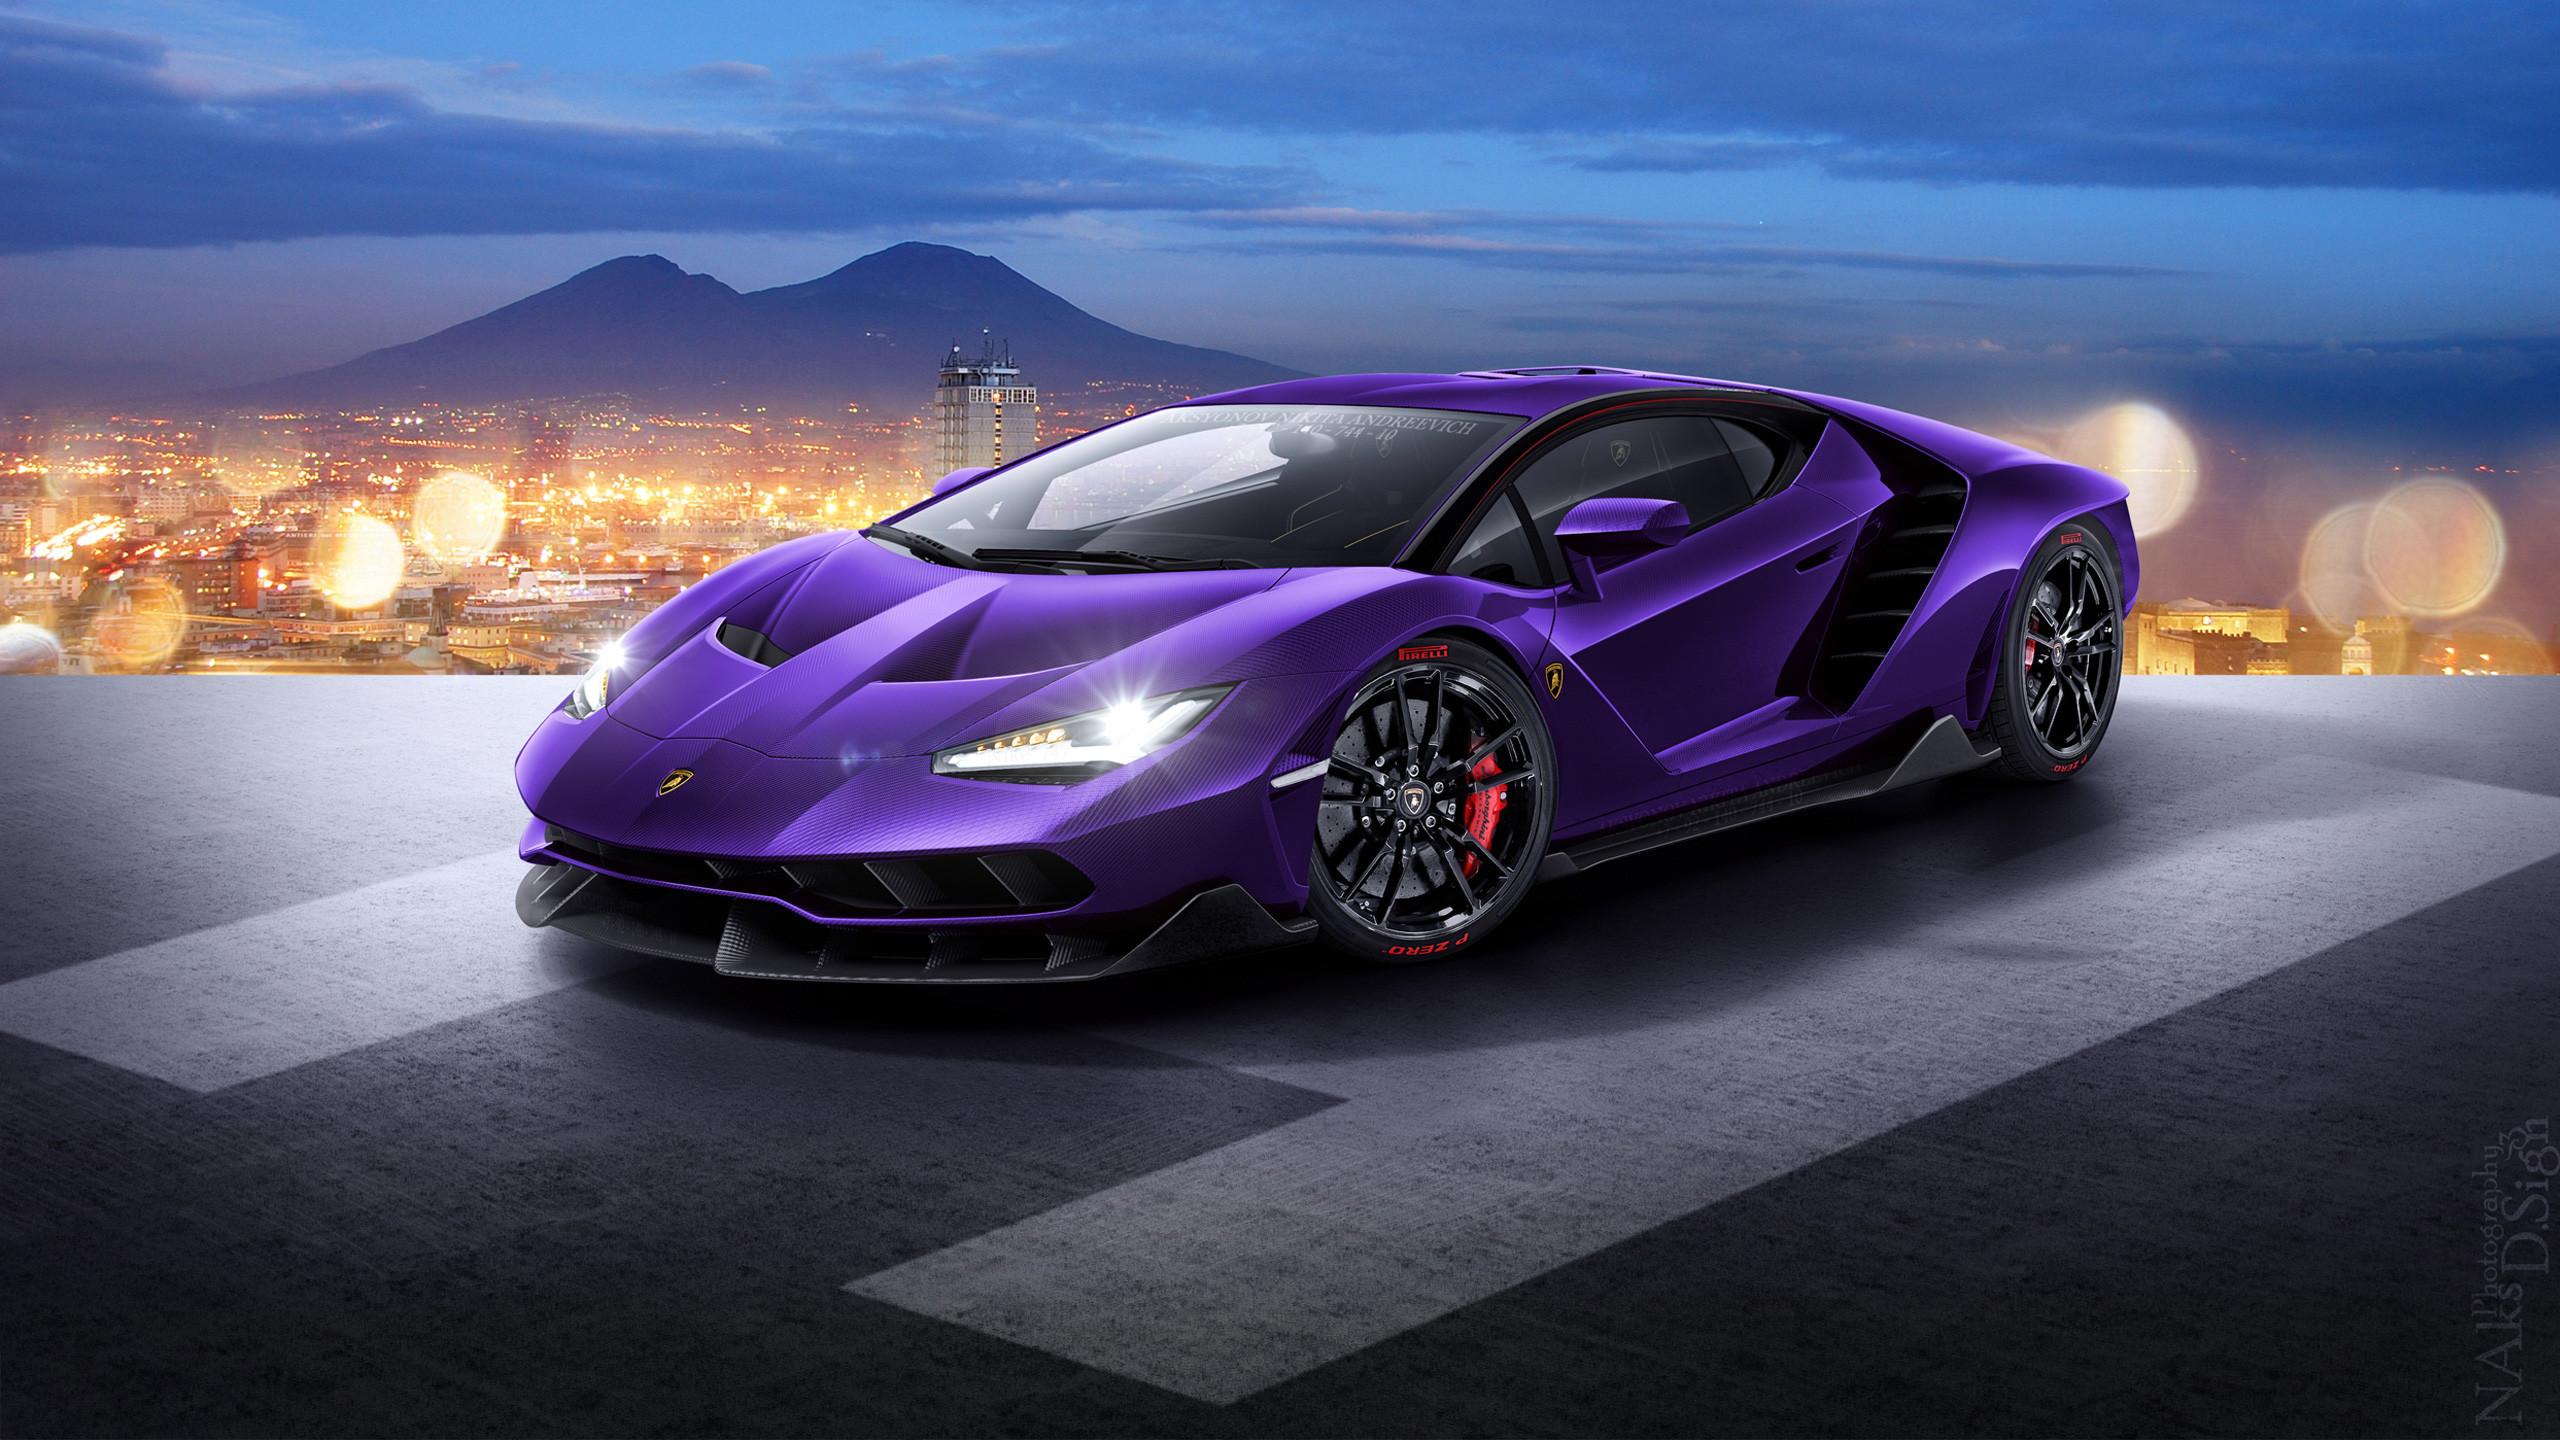 Res: 2560x1440, Cool Bugatti Wallpaper High Quality Resolution Is 4K Wallpaper